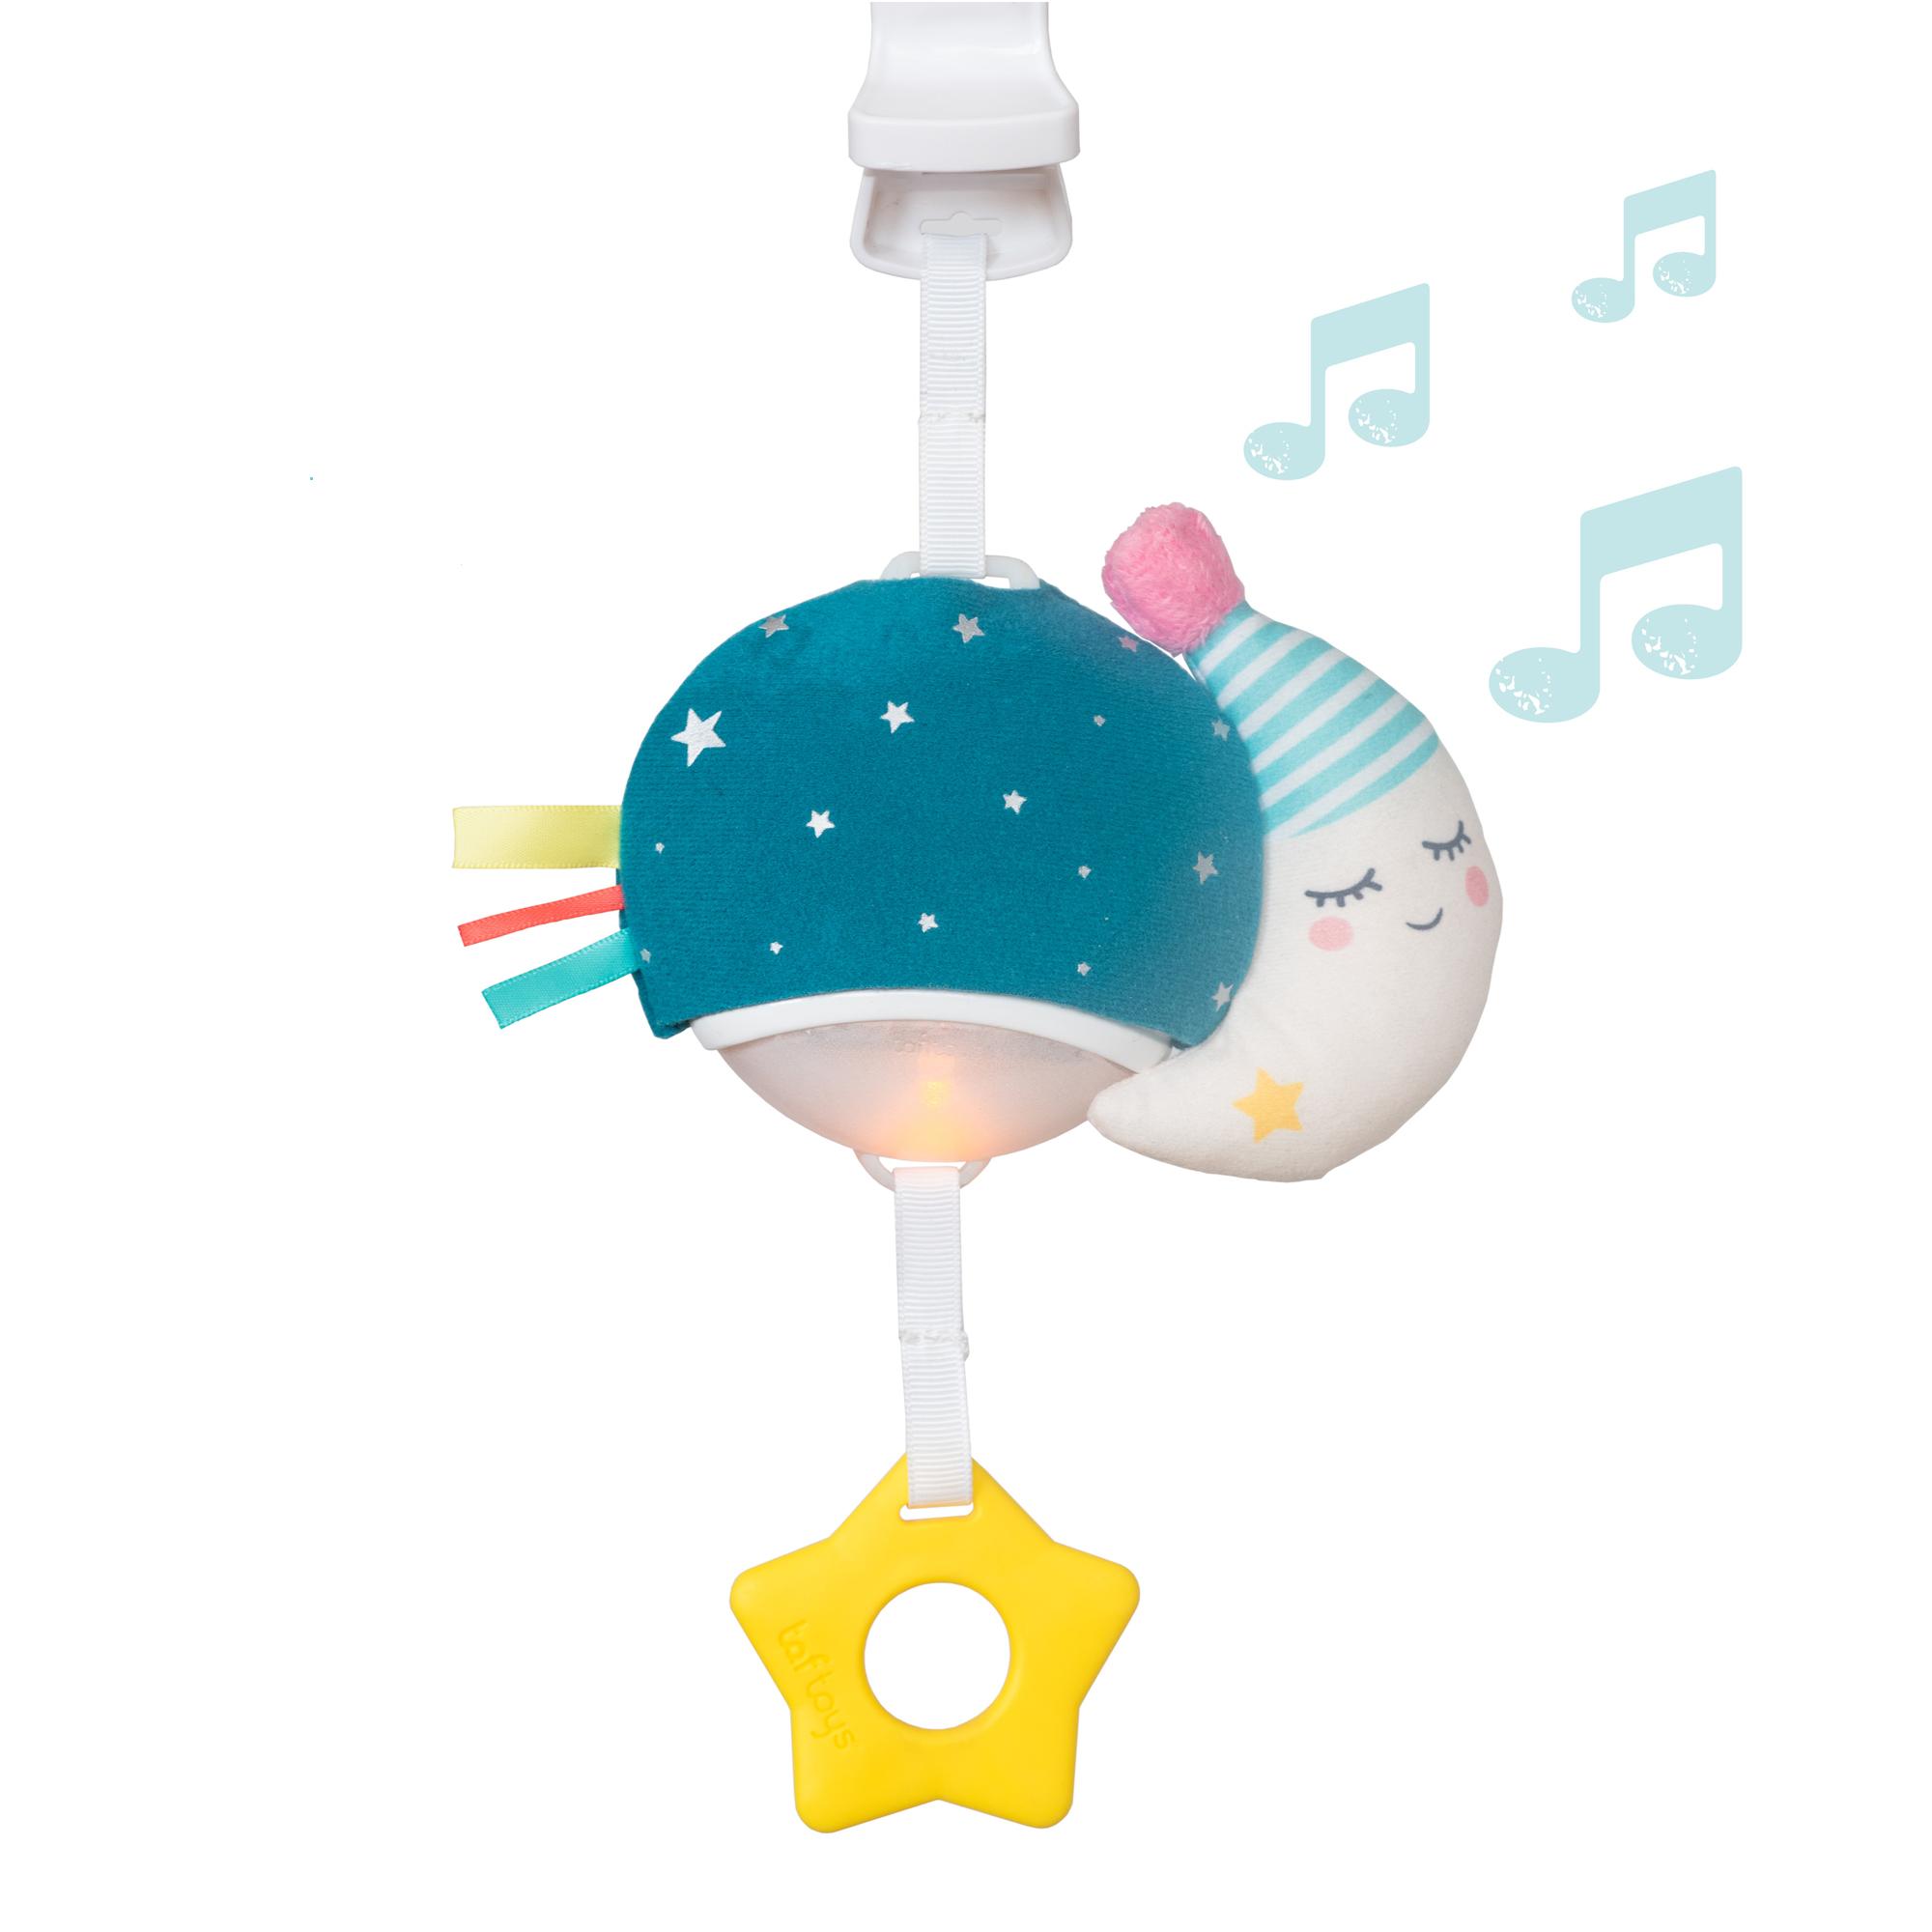 Taf Toys Κρεμαστό Μουσικό Παιχνίδι Musical Mini Moon T-12585